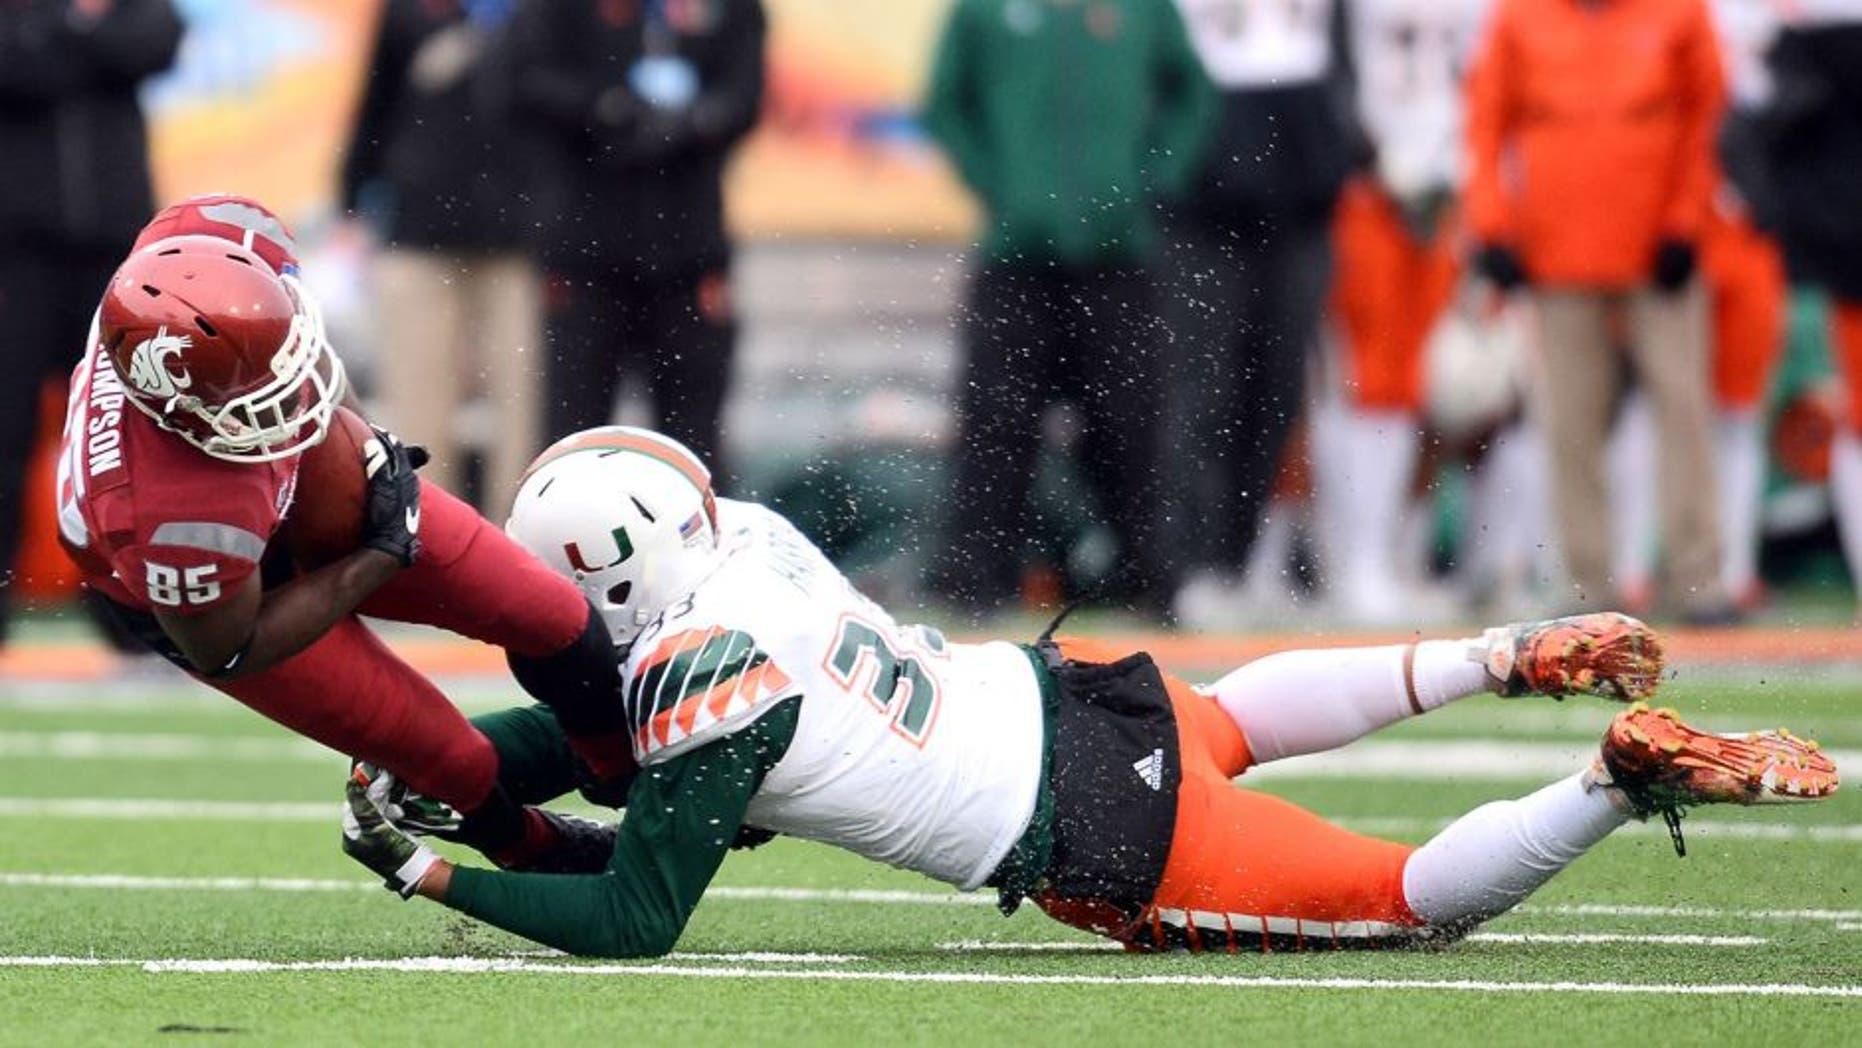 Dec 26, 2015; El Paso, TX, USA; Miami Hurricanes defensive lineman Trent Harris (33) tackles Washington State Cougars wide receiver John Thompson (85) during the second half at Sun Bowl Stadium. Mandatory Credit: Joe Camporeale-USA TODAY Sports